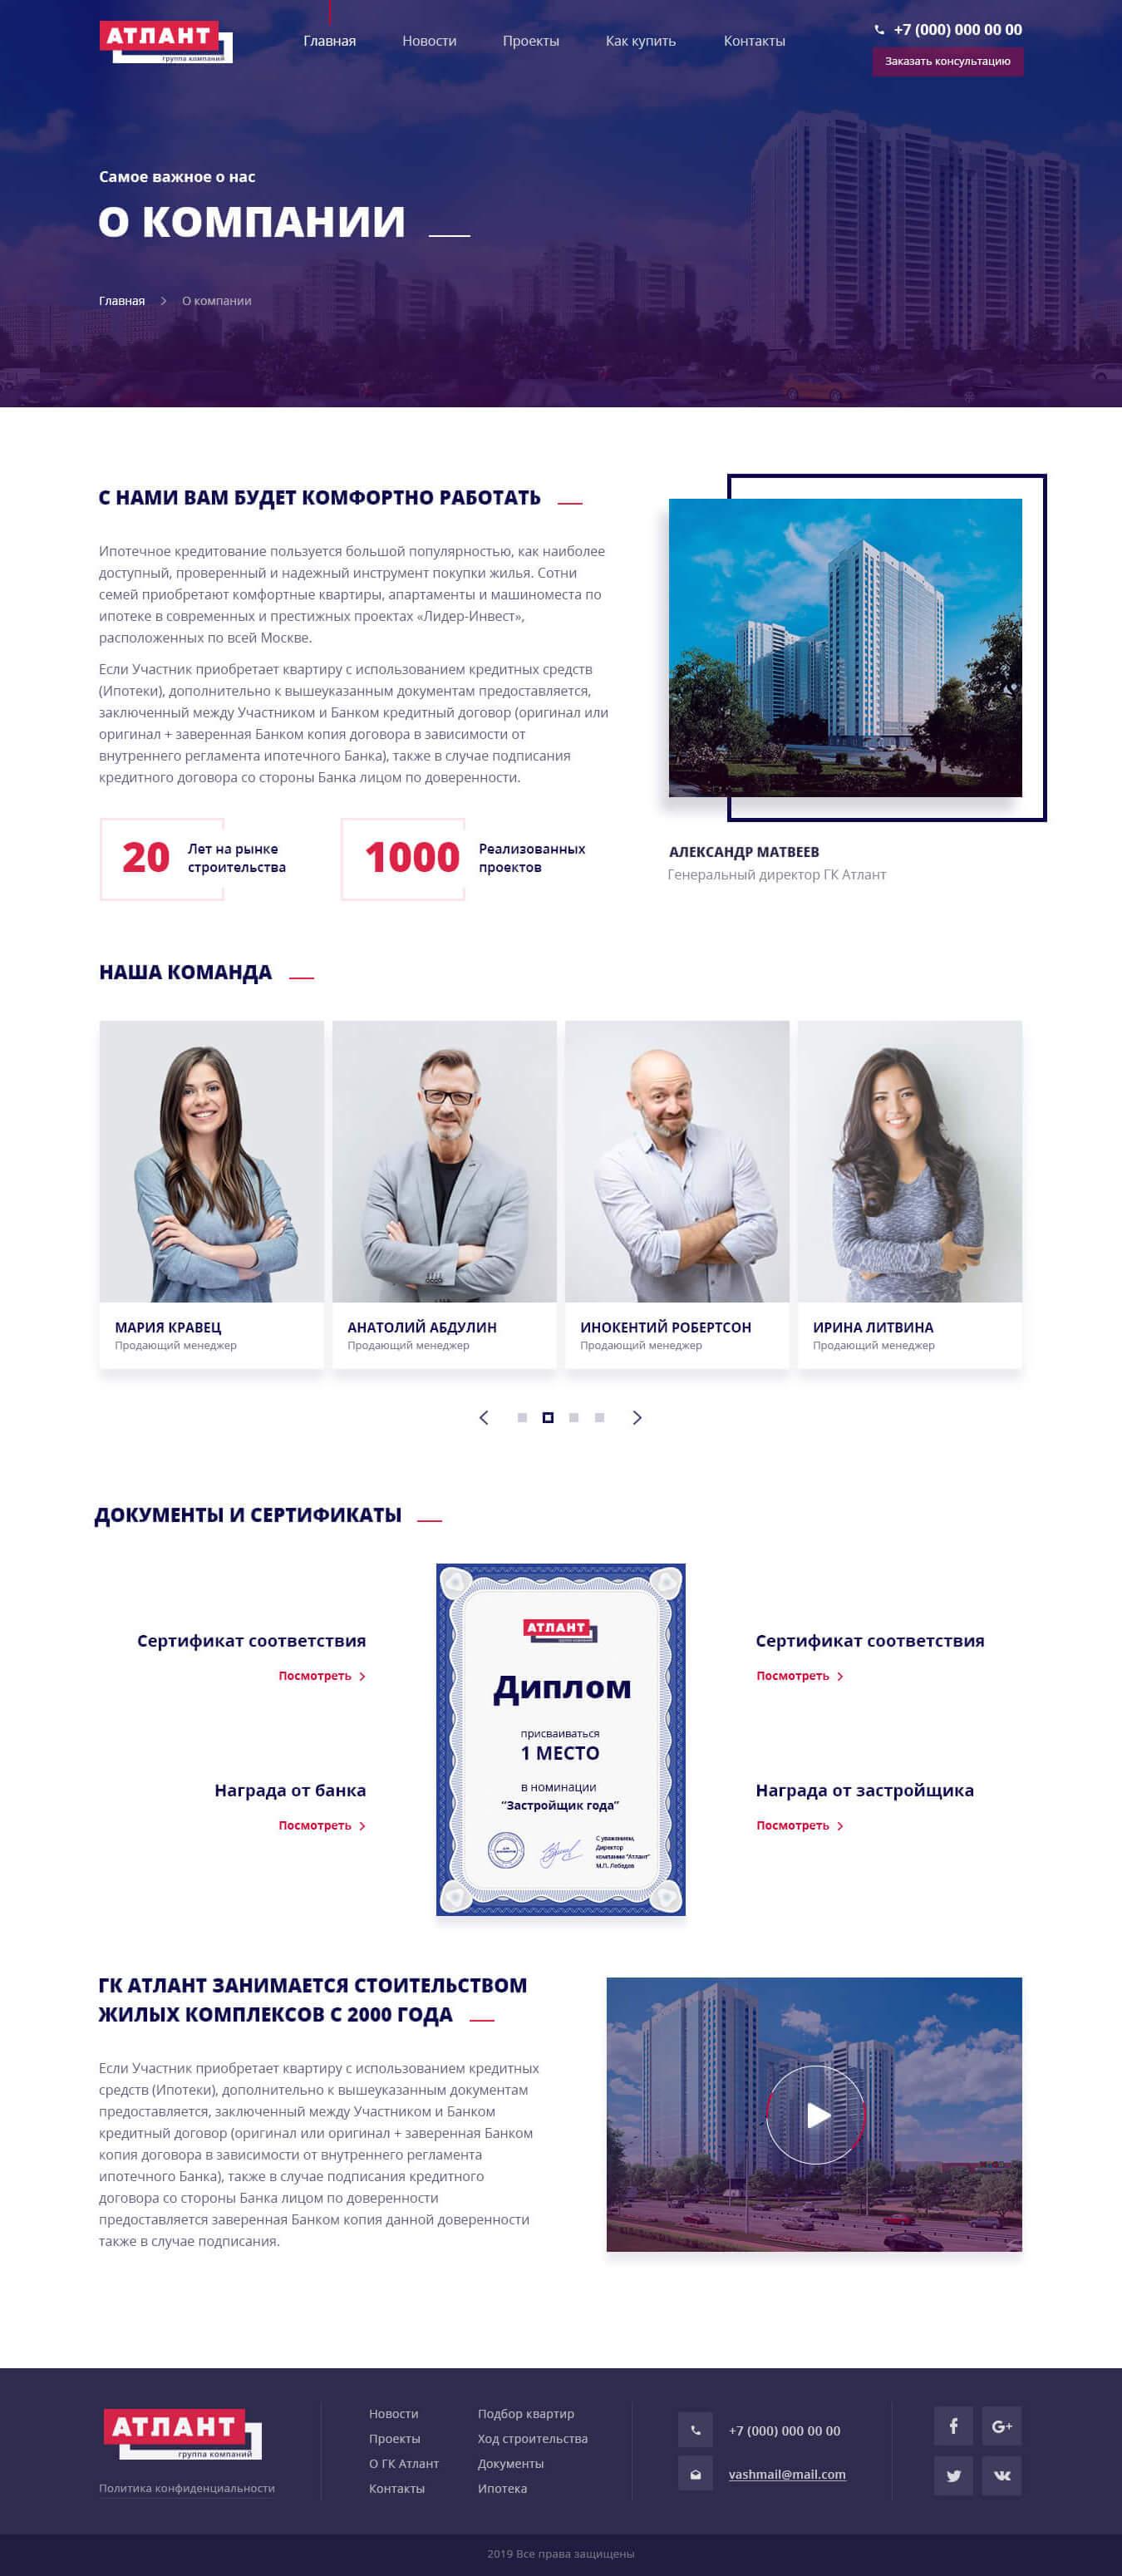 Atlant_About company_01